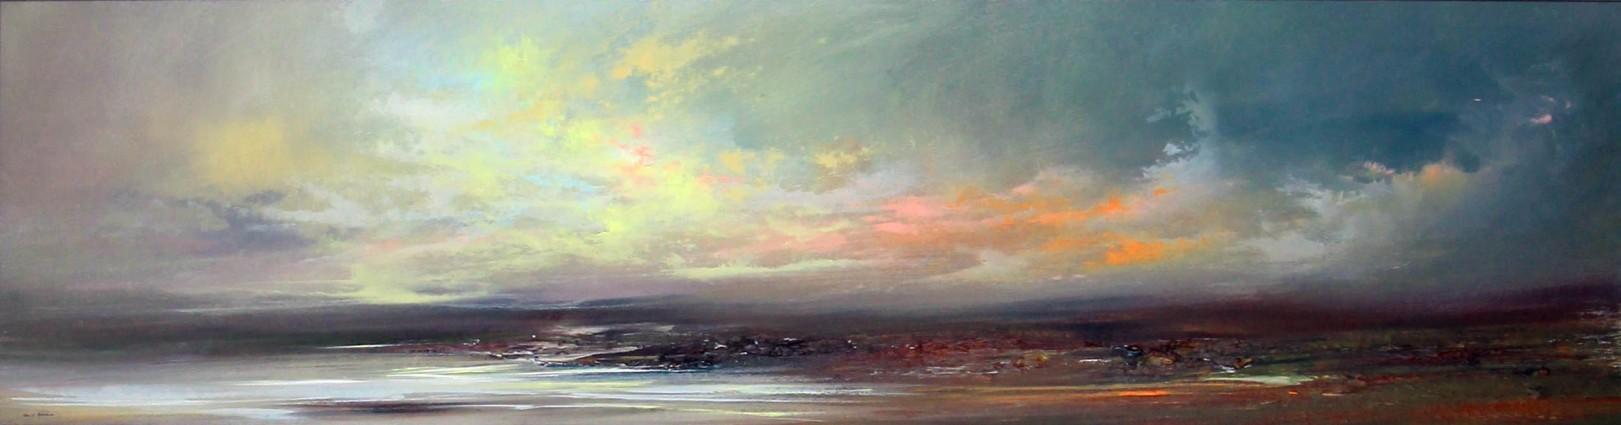 Philip Raskin_Original Acrylic_Early Light, Iona_16x60_